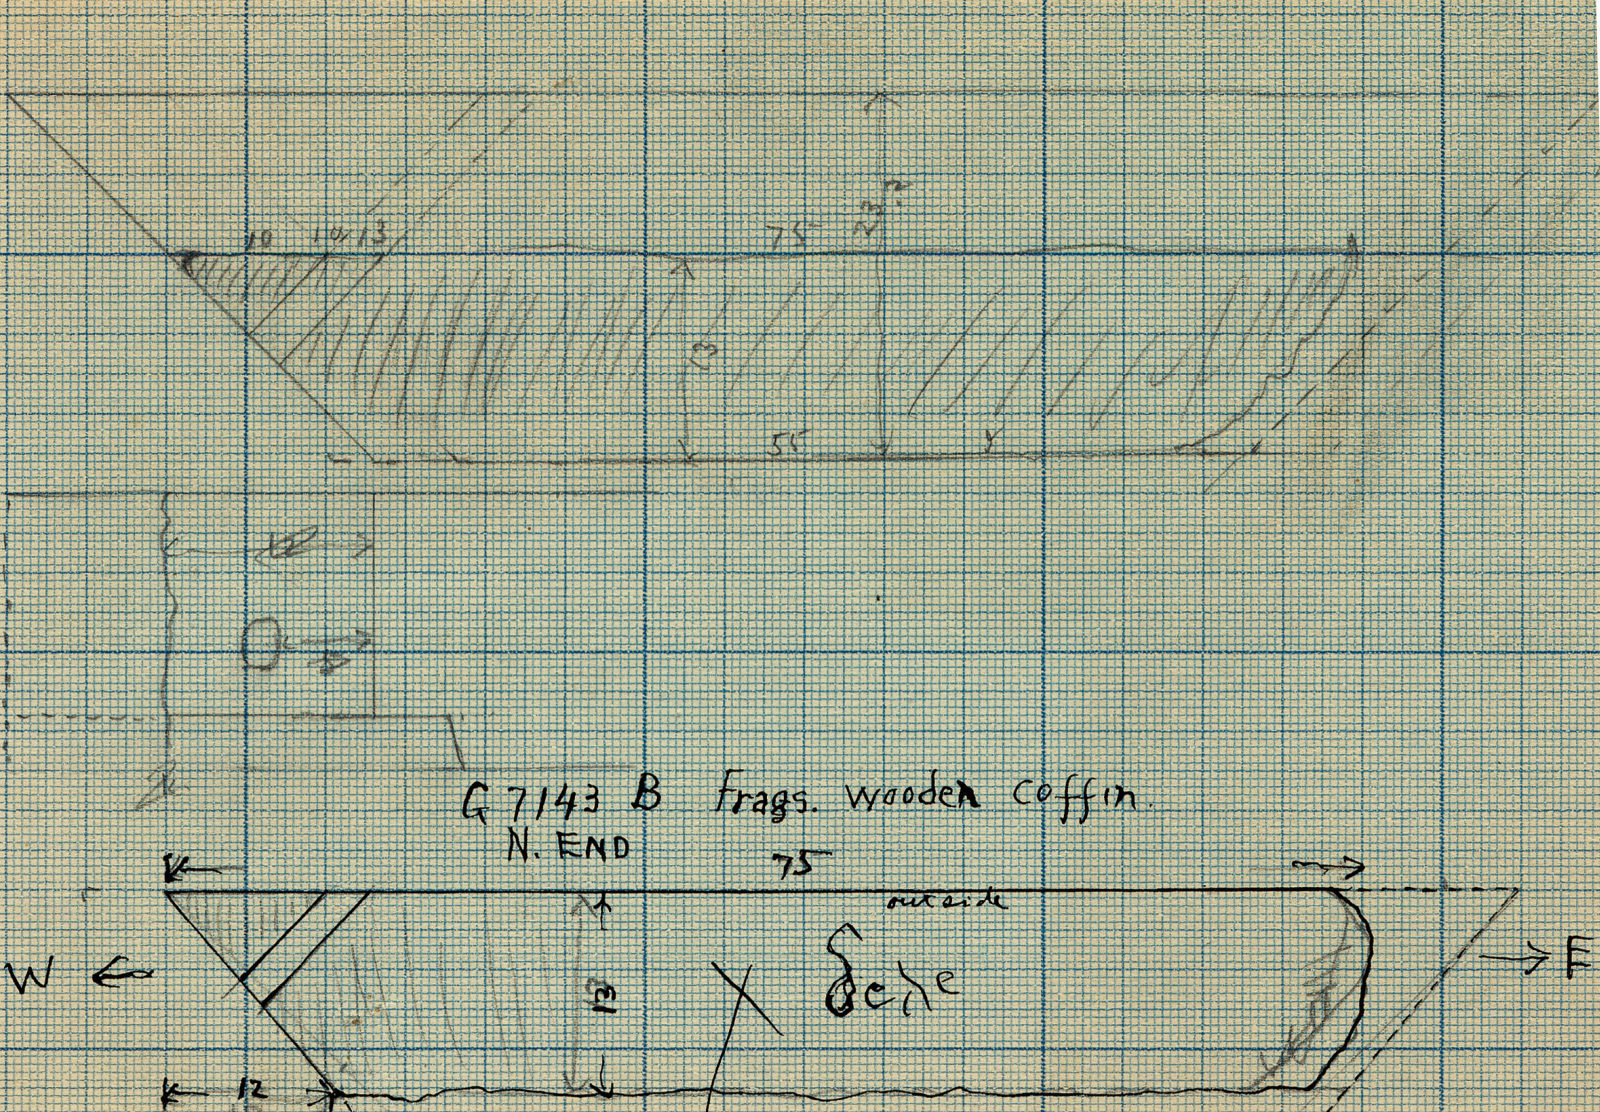 Drawings: G 7143, Shaft B: coffin fragments, wood